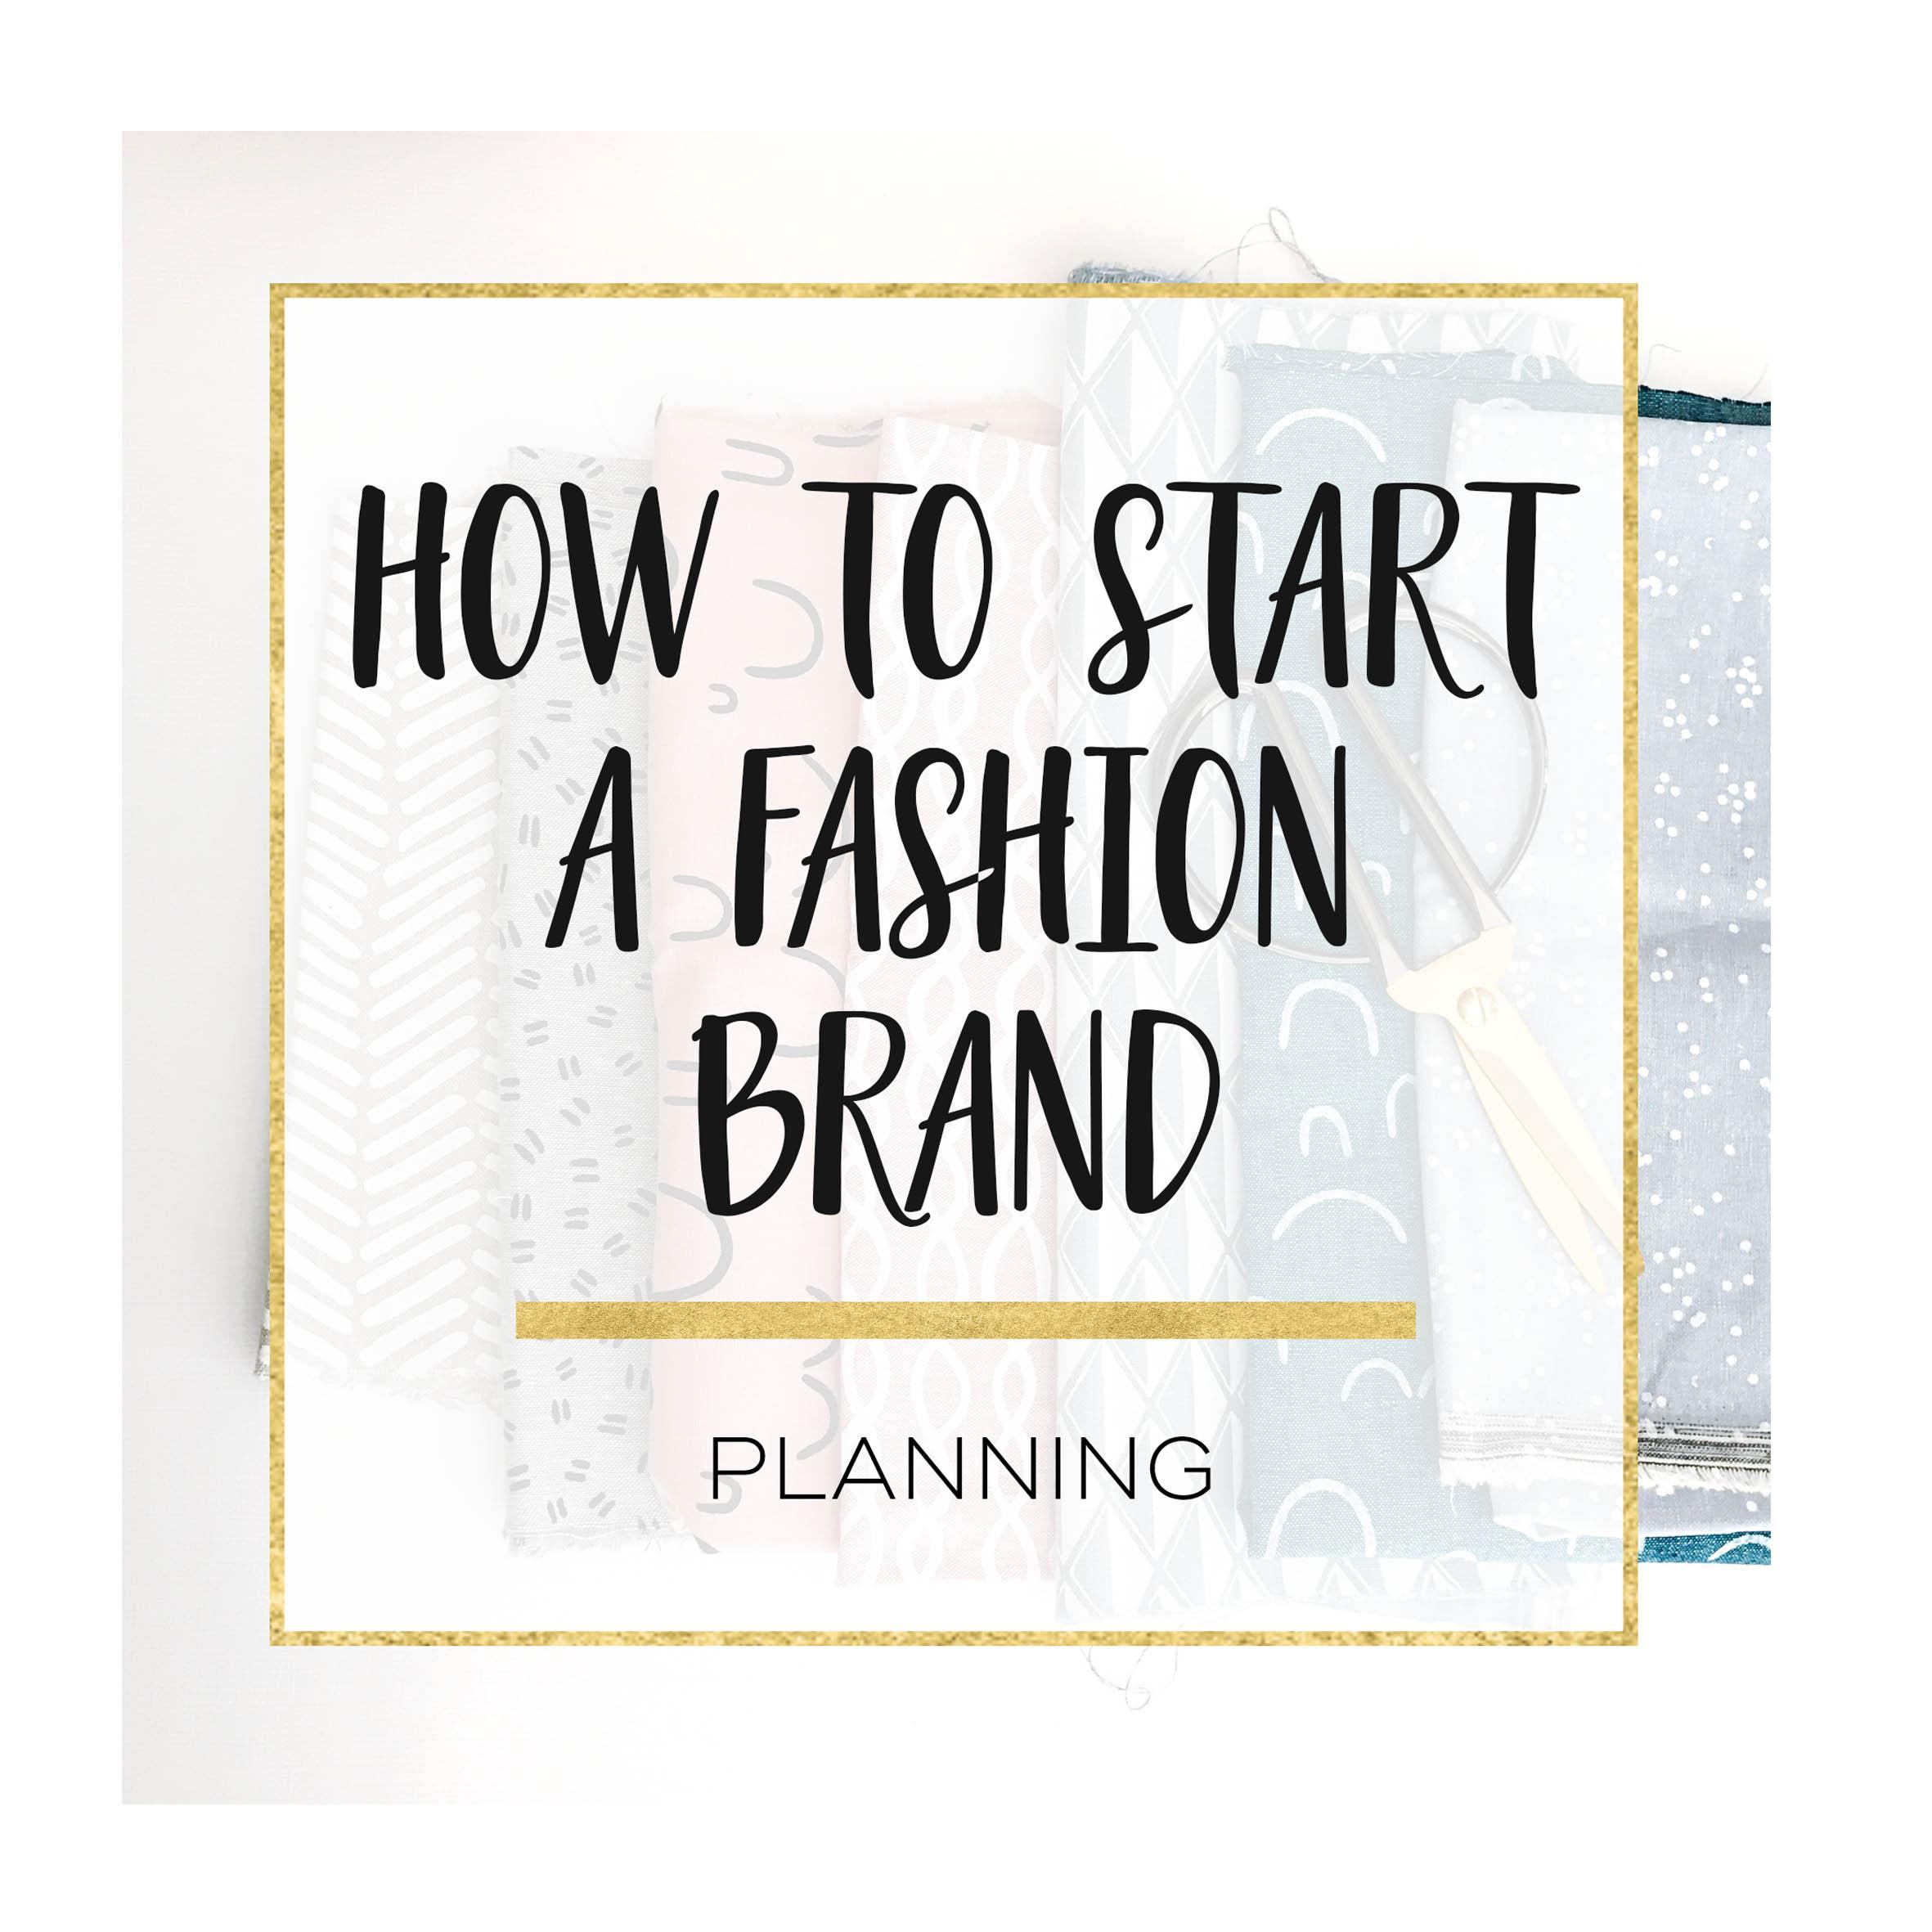 Planning A Fashion Brand